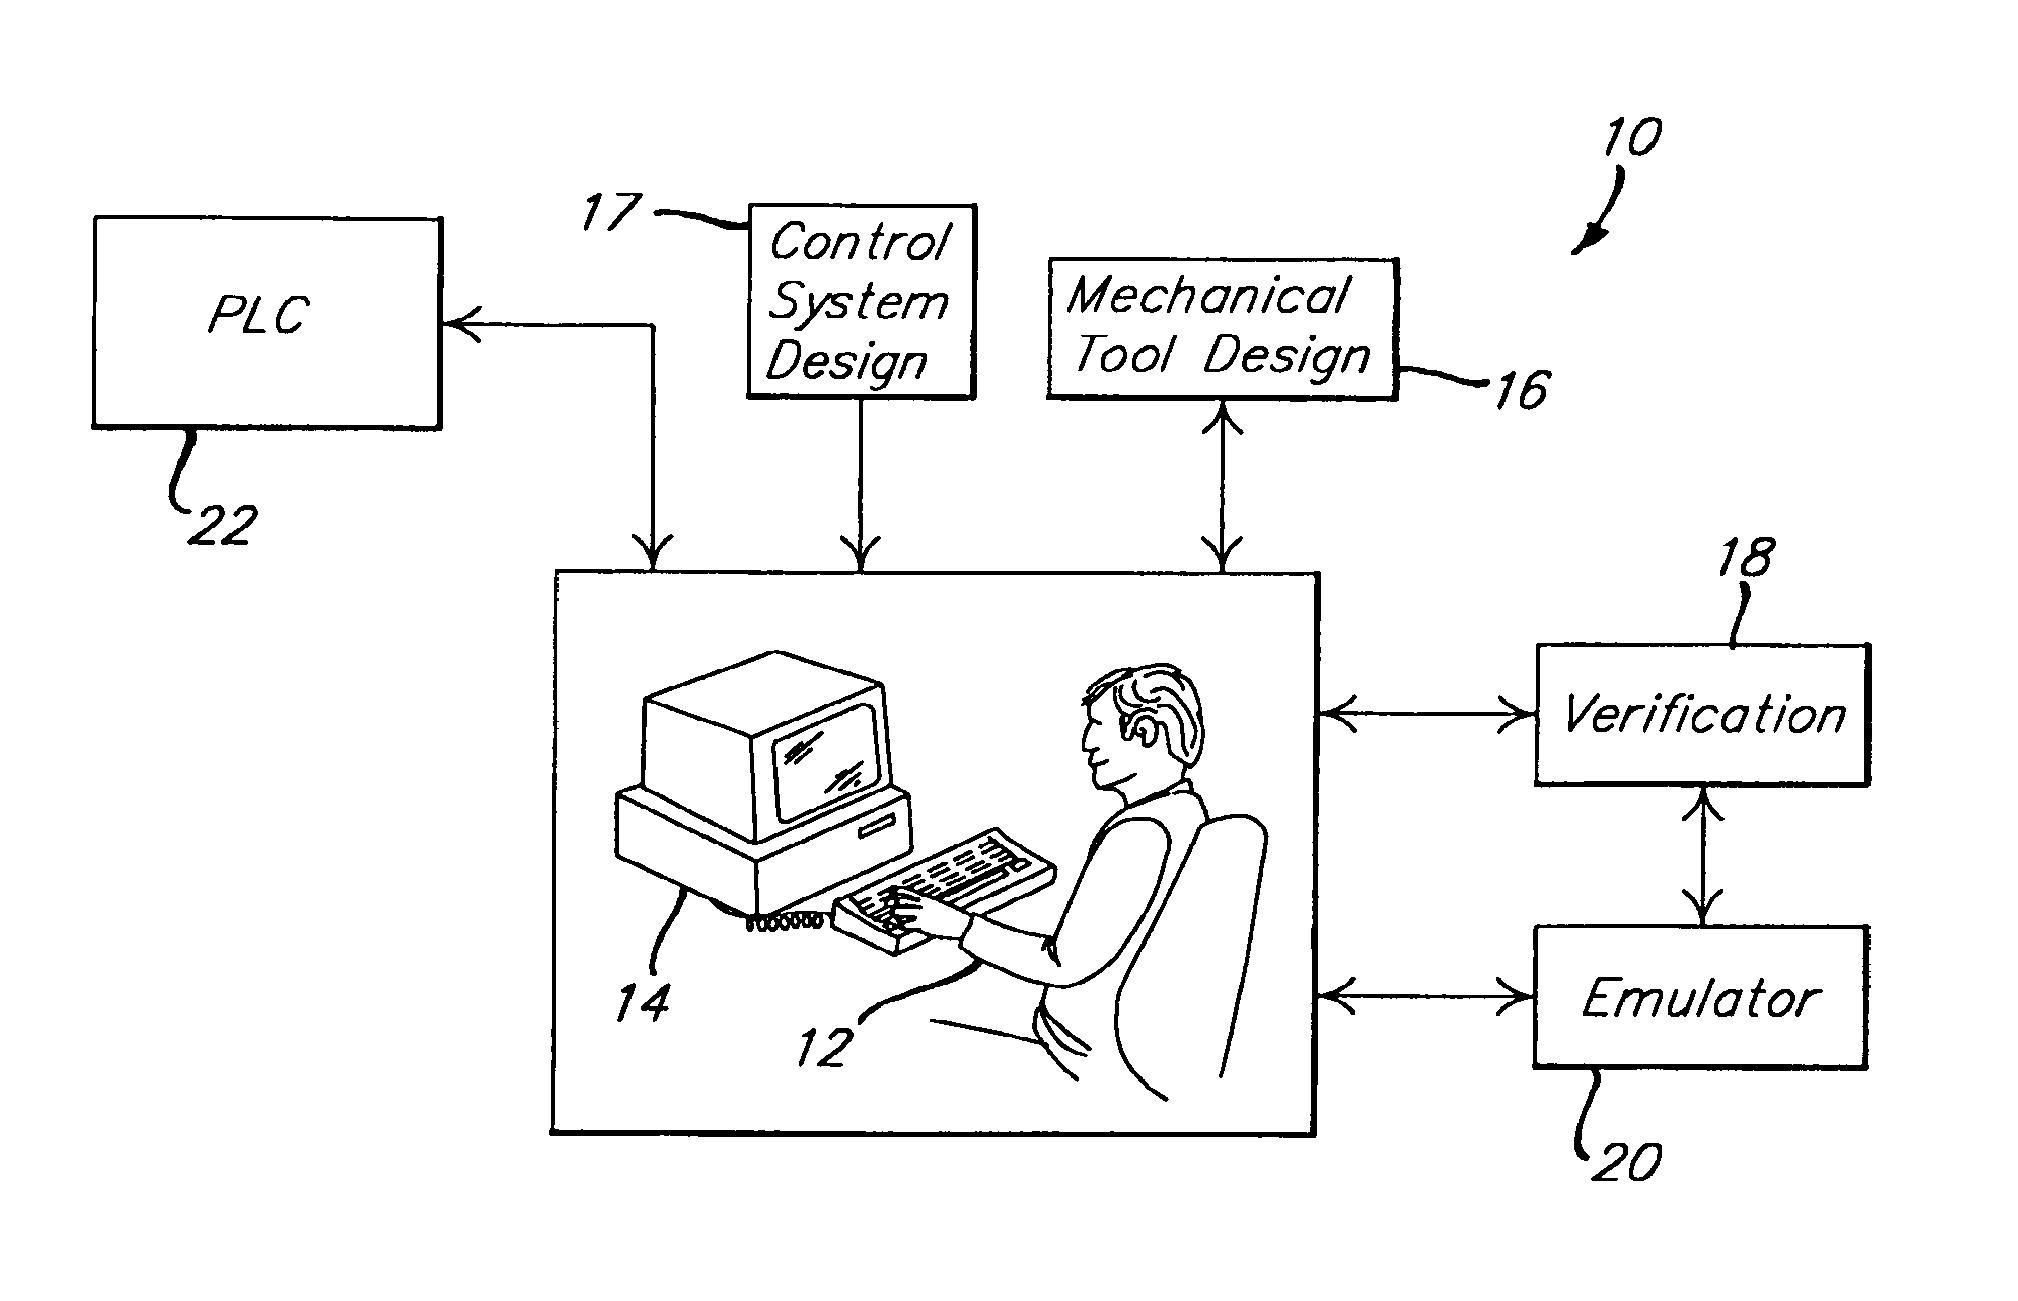 Patent Us8135567 Method Of Emulating Machine Tool Behavior For Logic Control Diagram Drawing